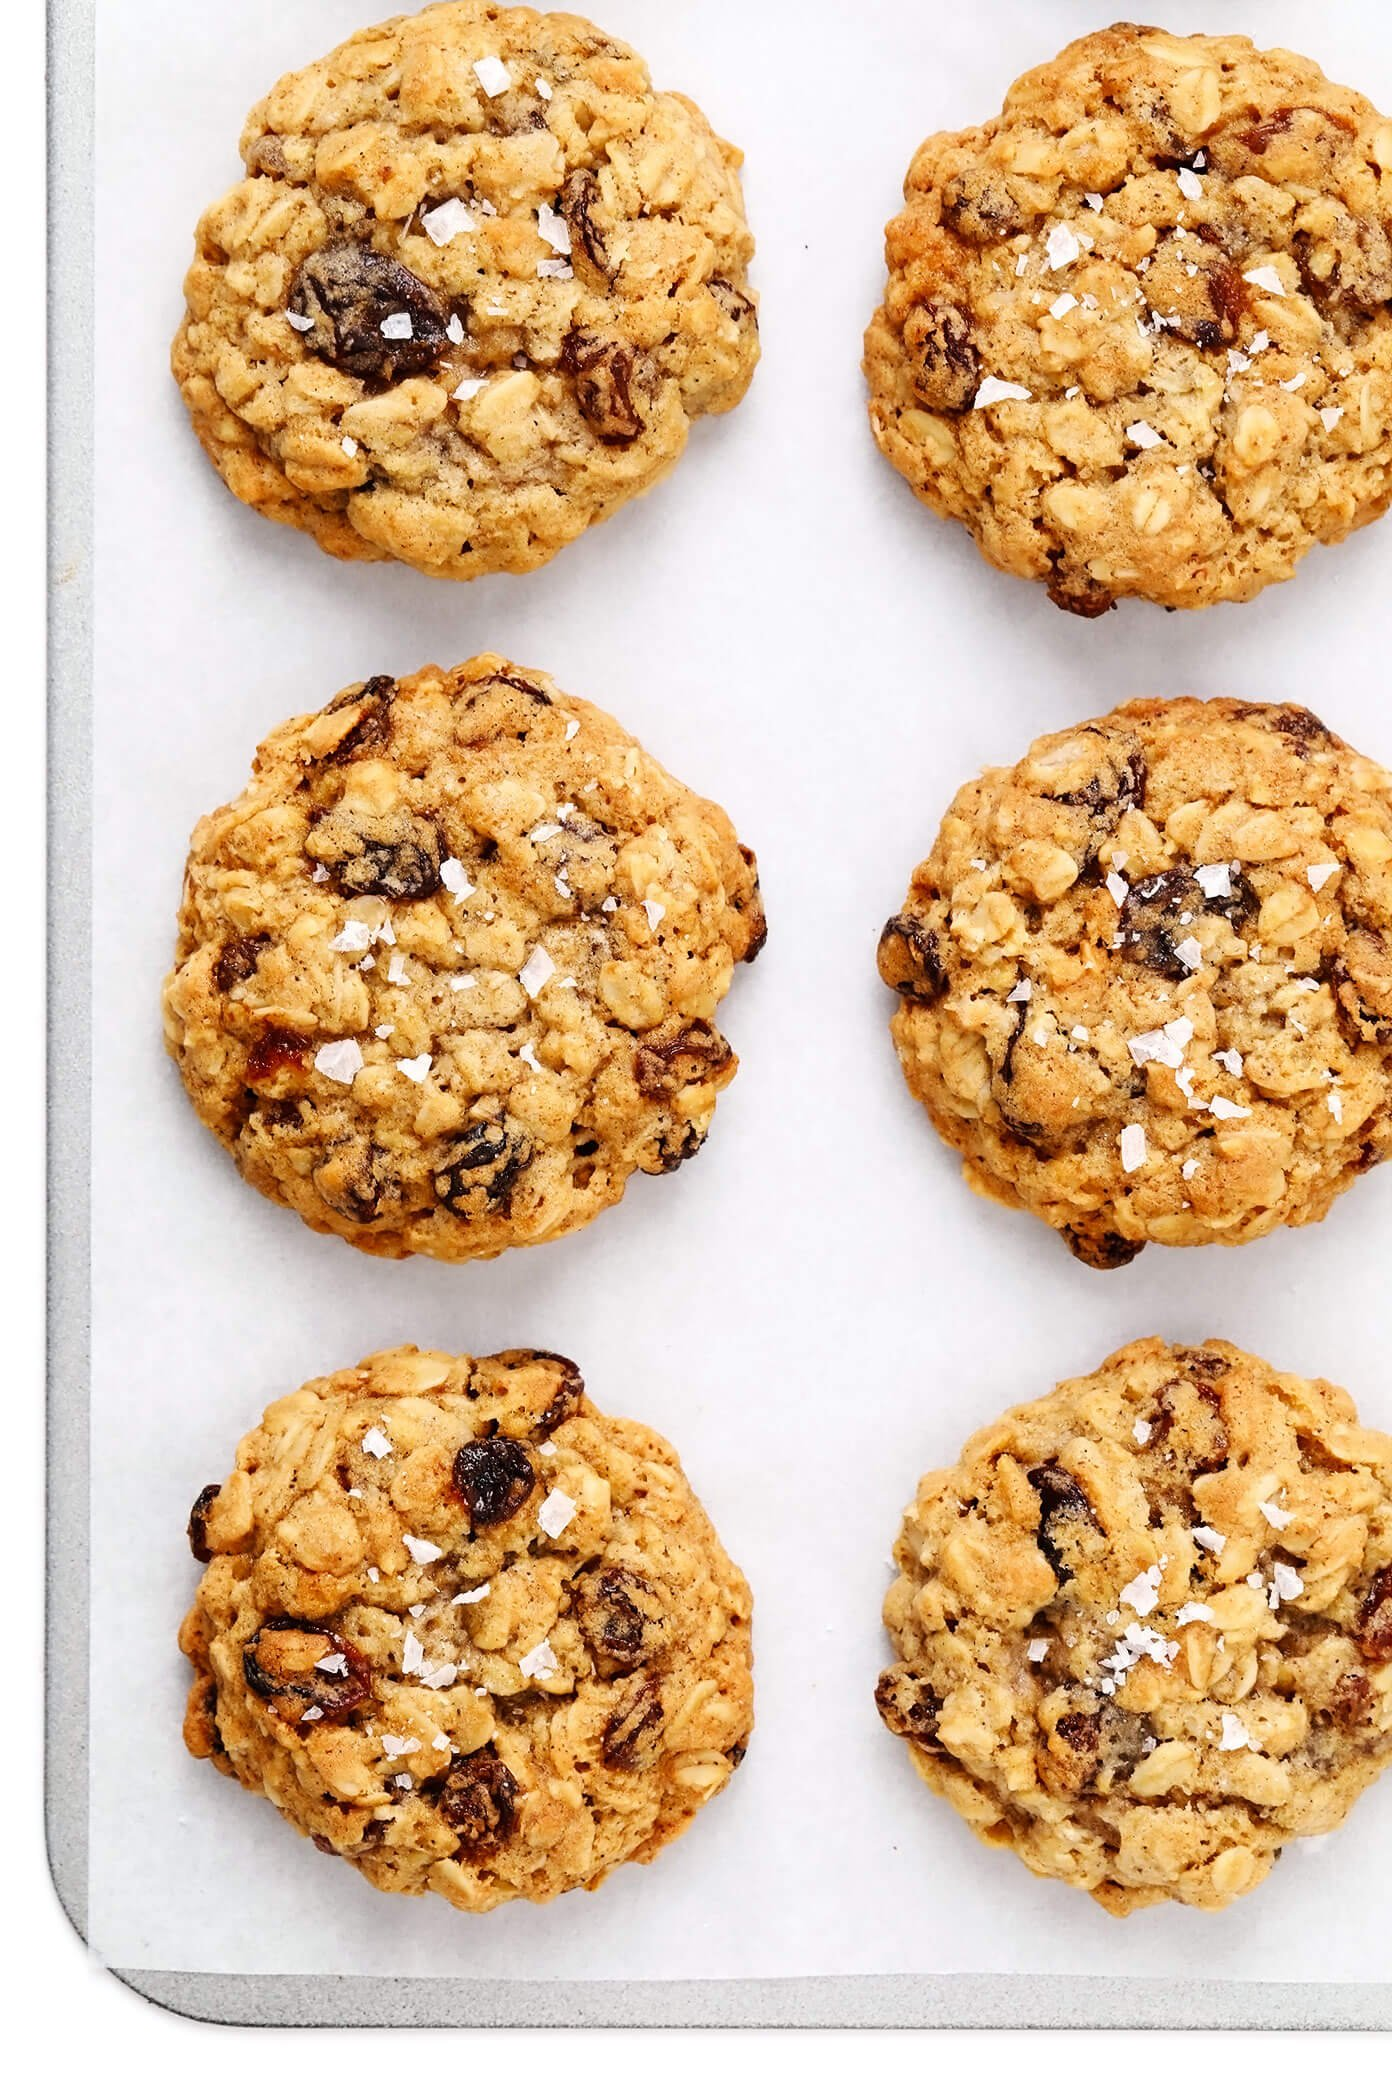 Oatmeal Raisin Cookies with Flaky Sea Salt